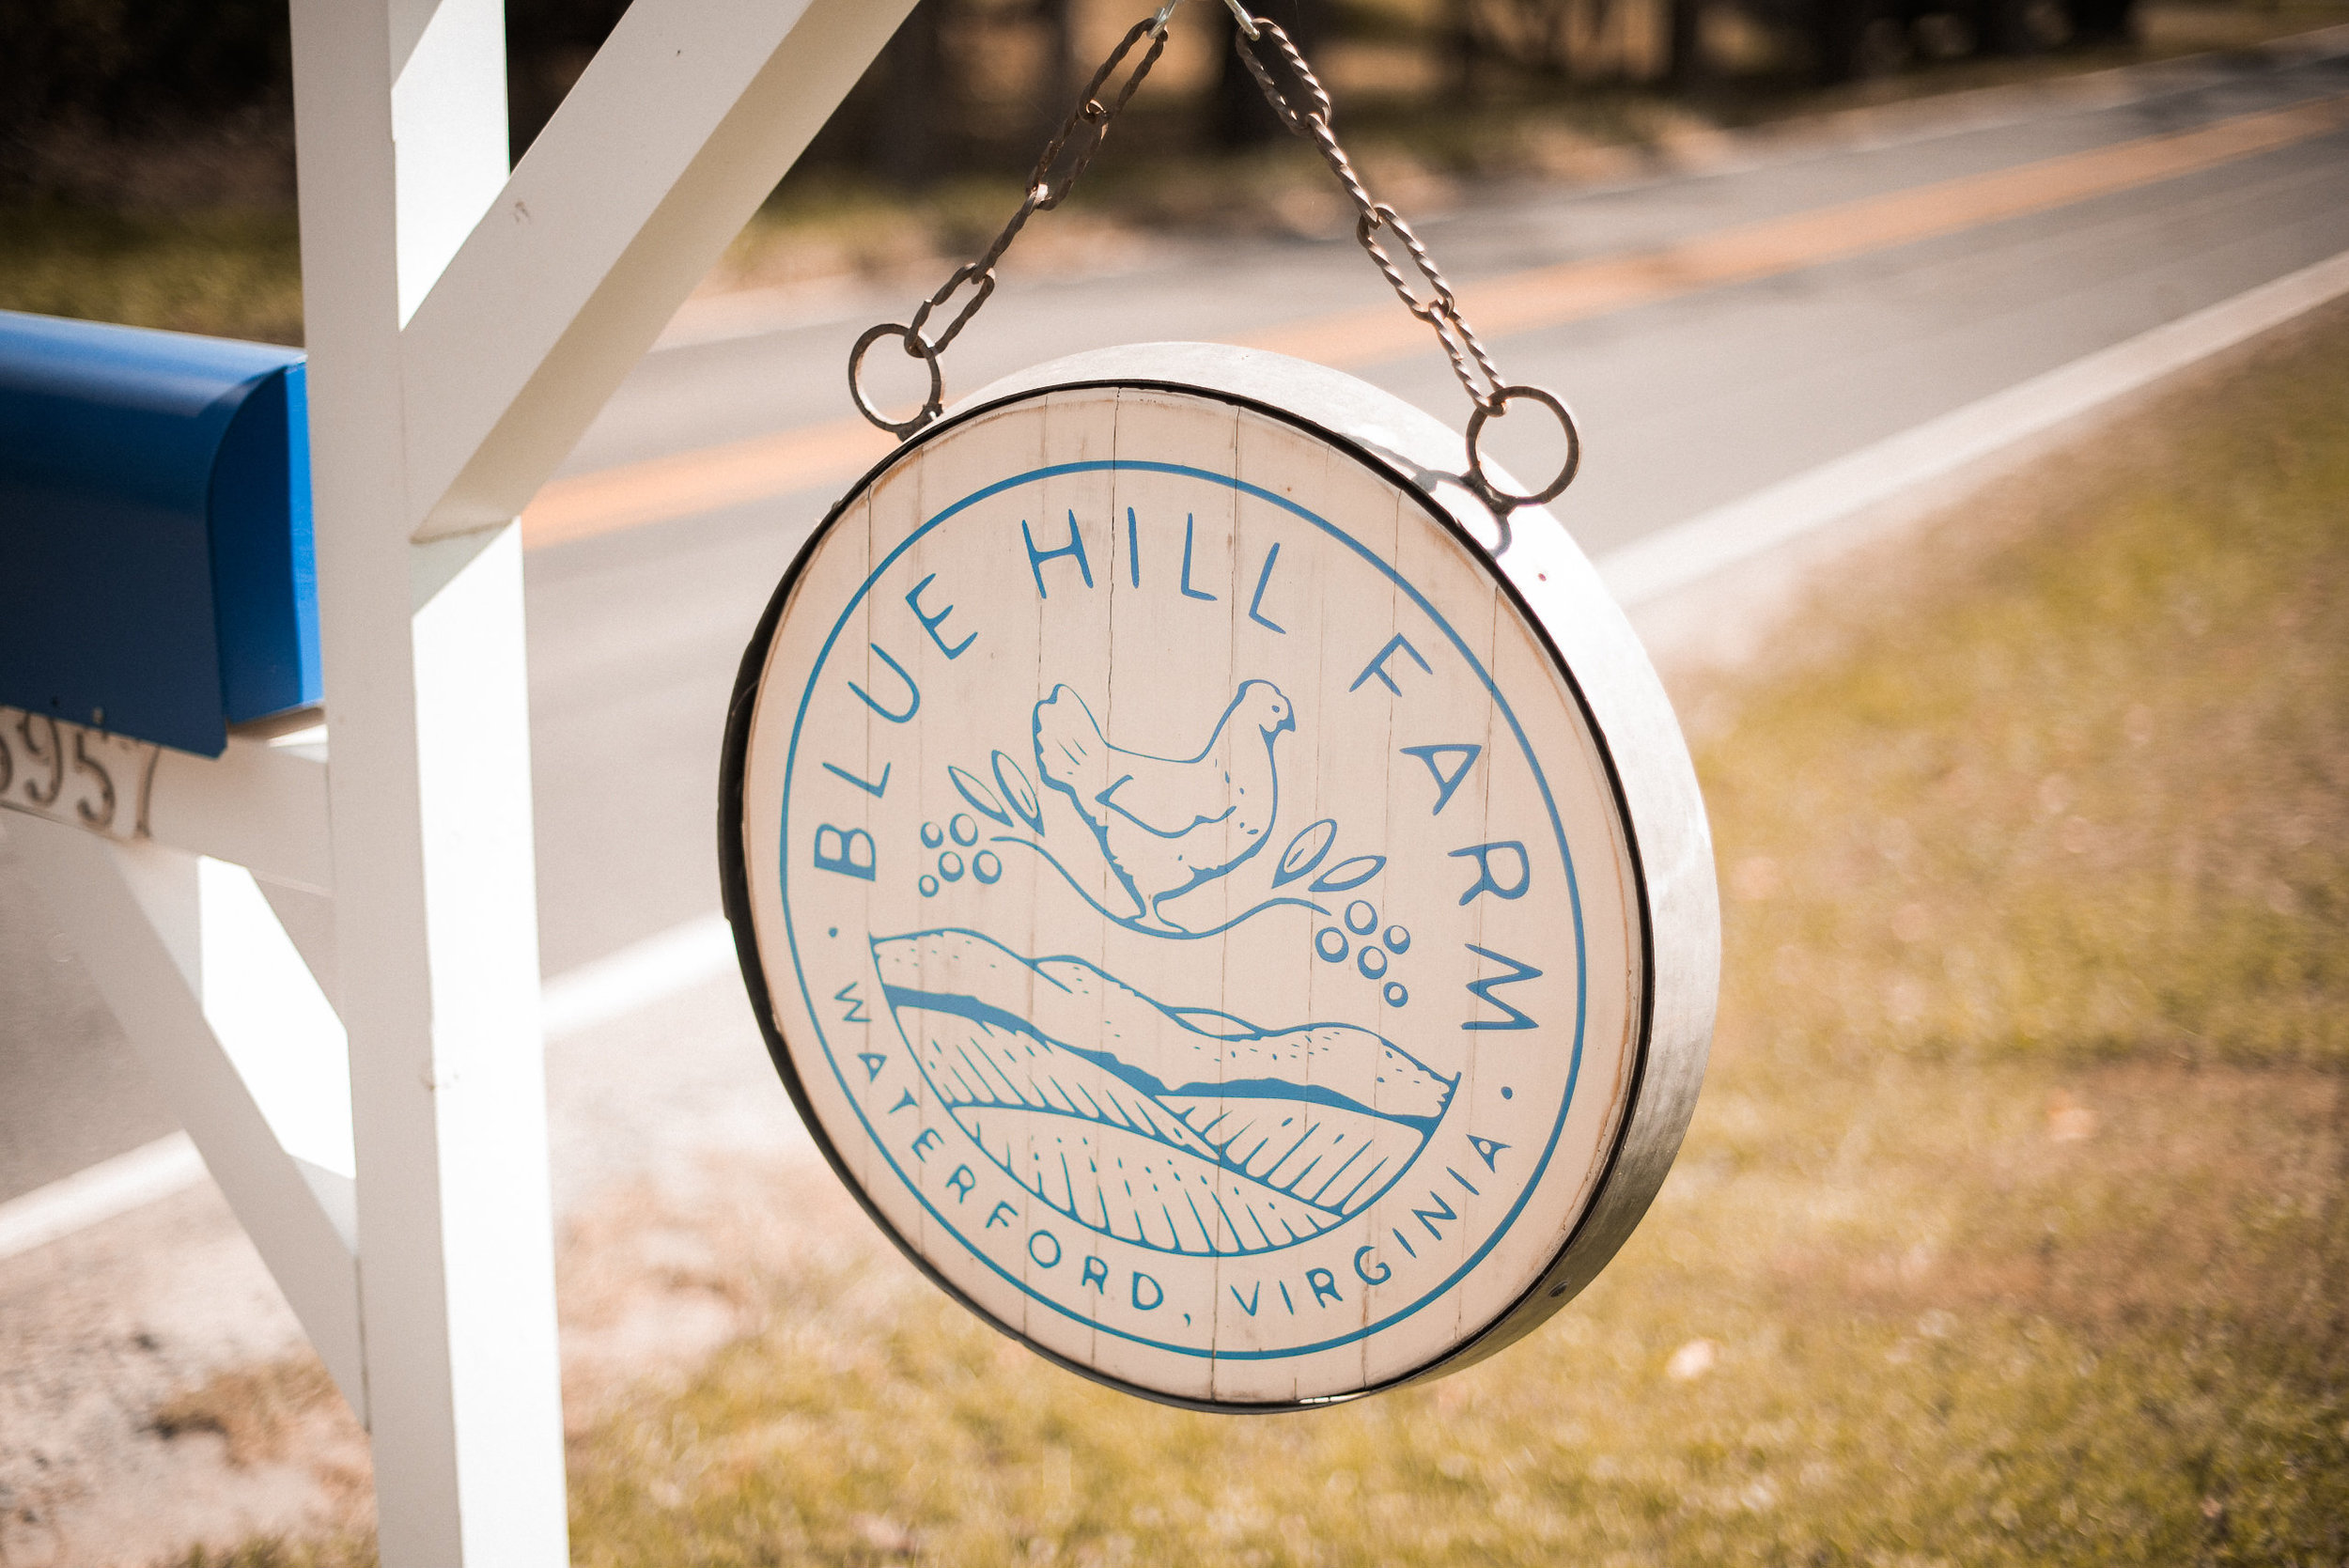 Blue Hill Farm sign